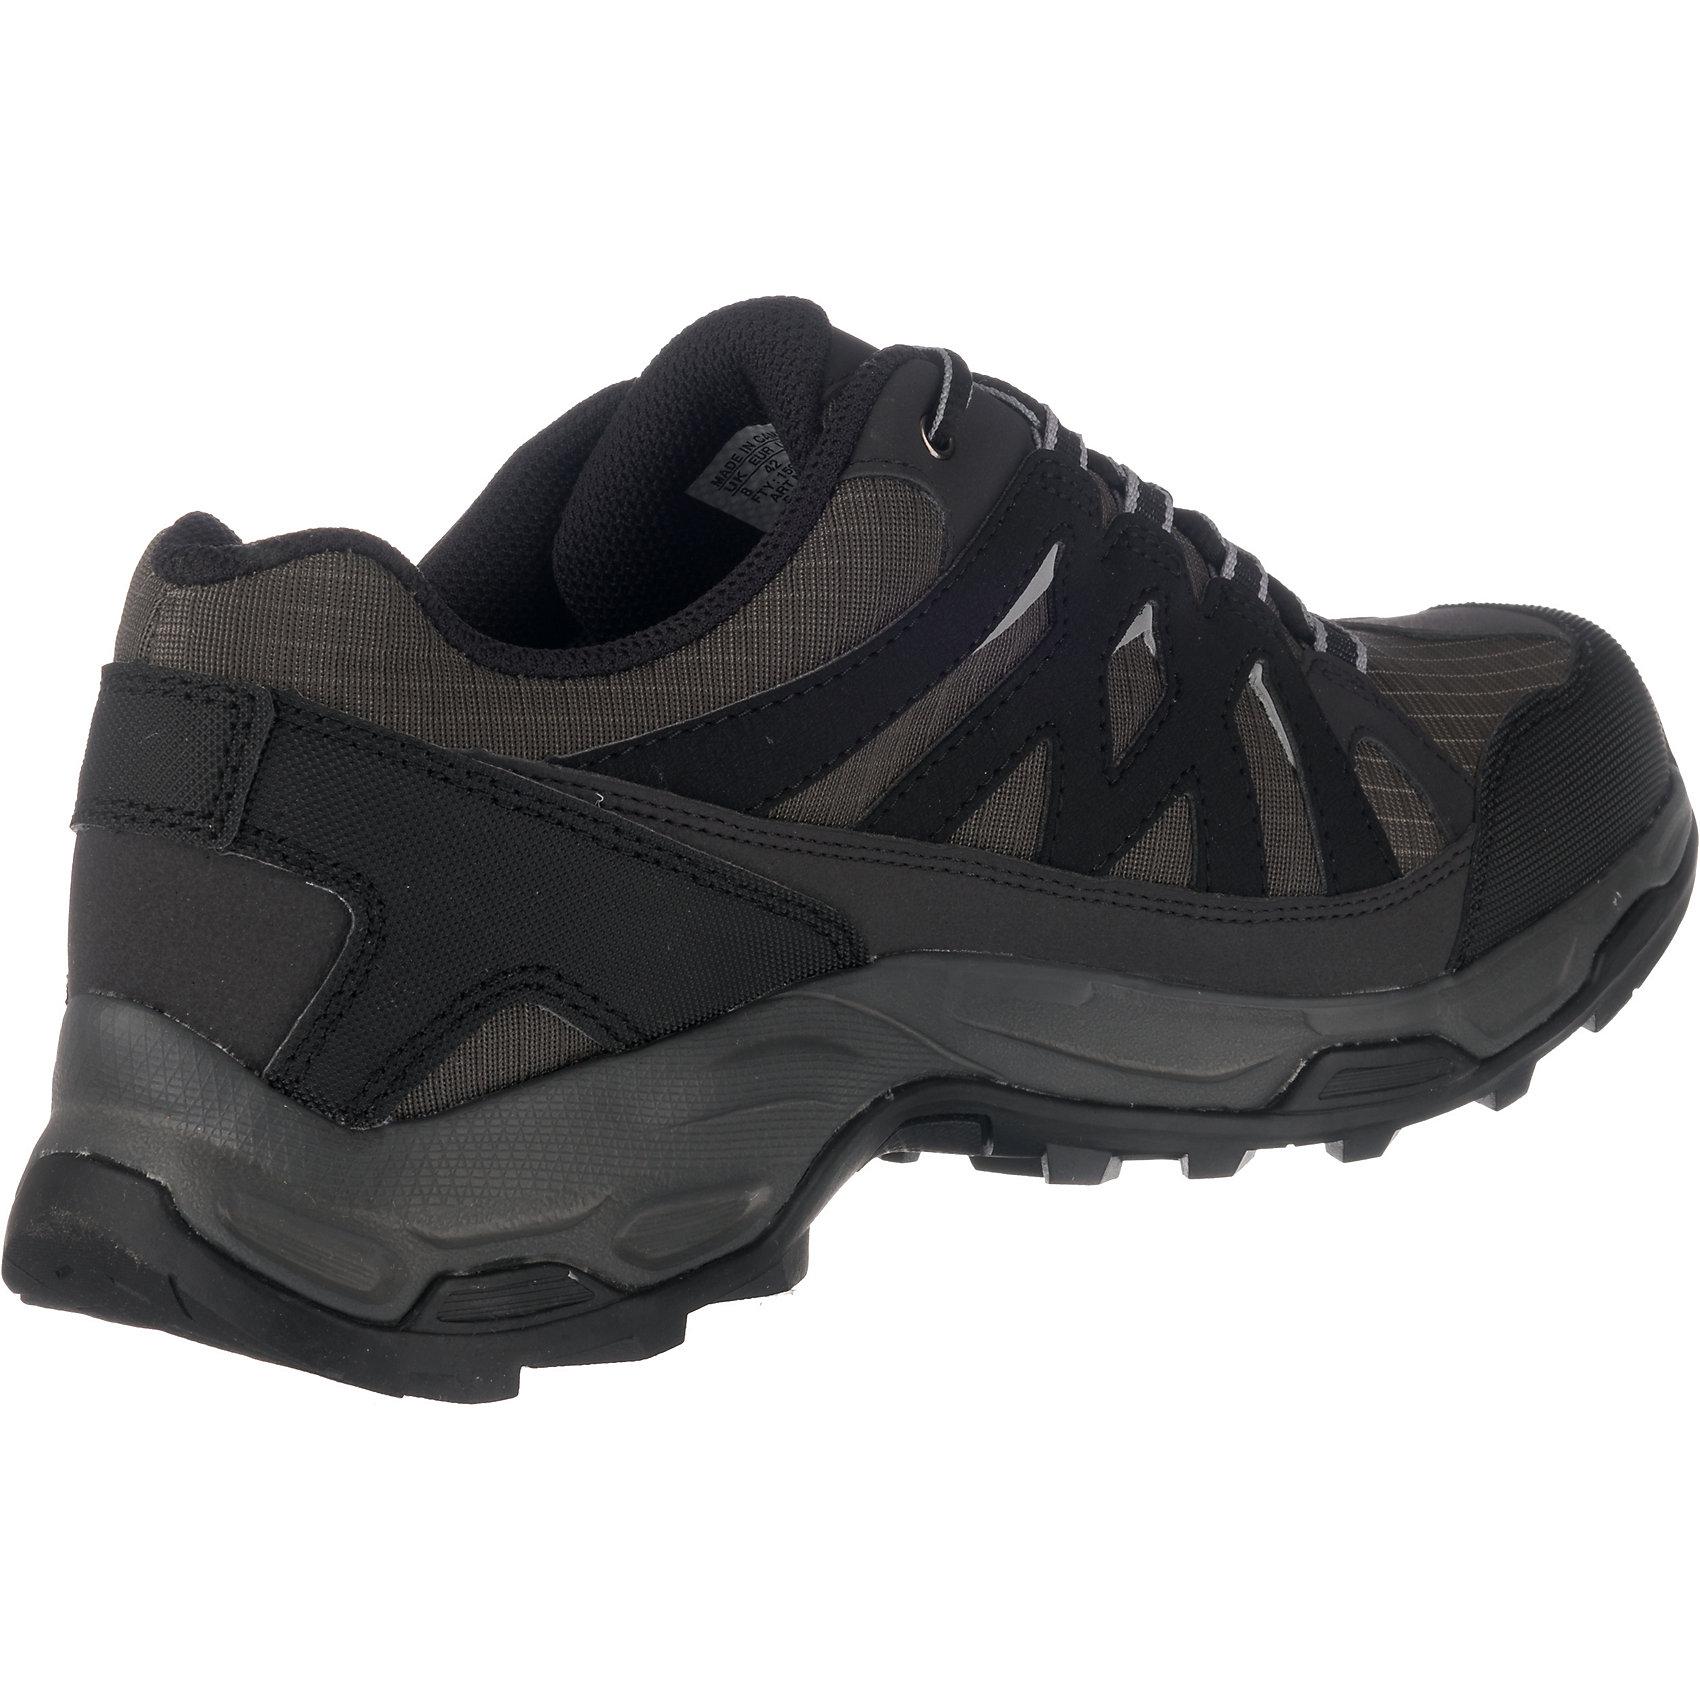 c75e822dabb6 Neu Salomon Schuhe EFFECT GTX® Magnet Black Monument Trekkingschuhe ...